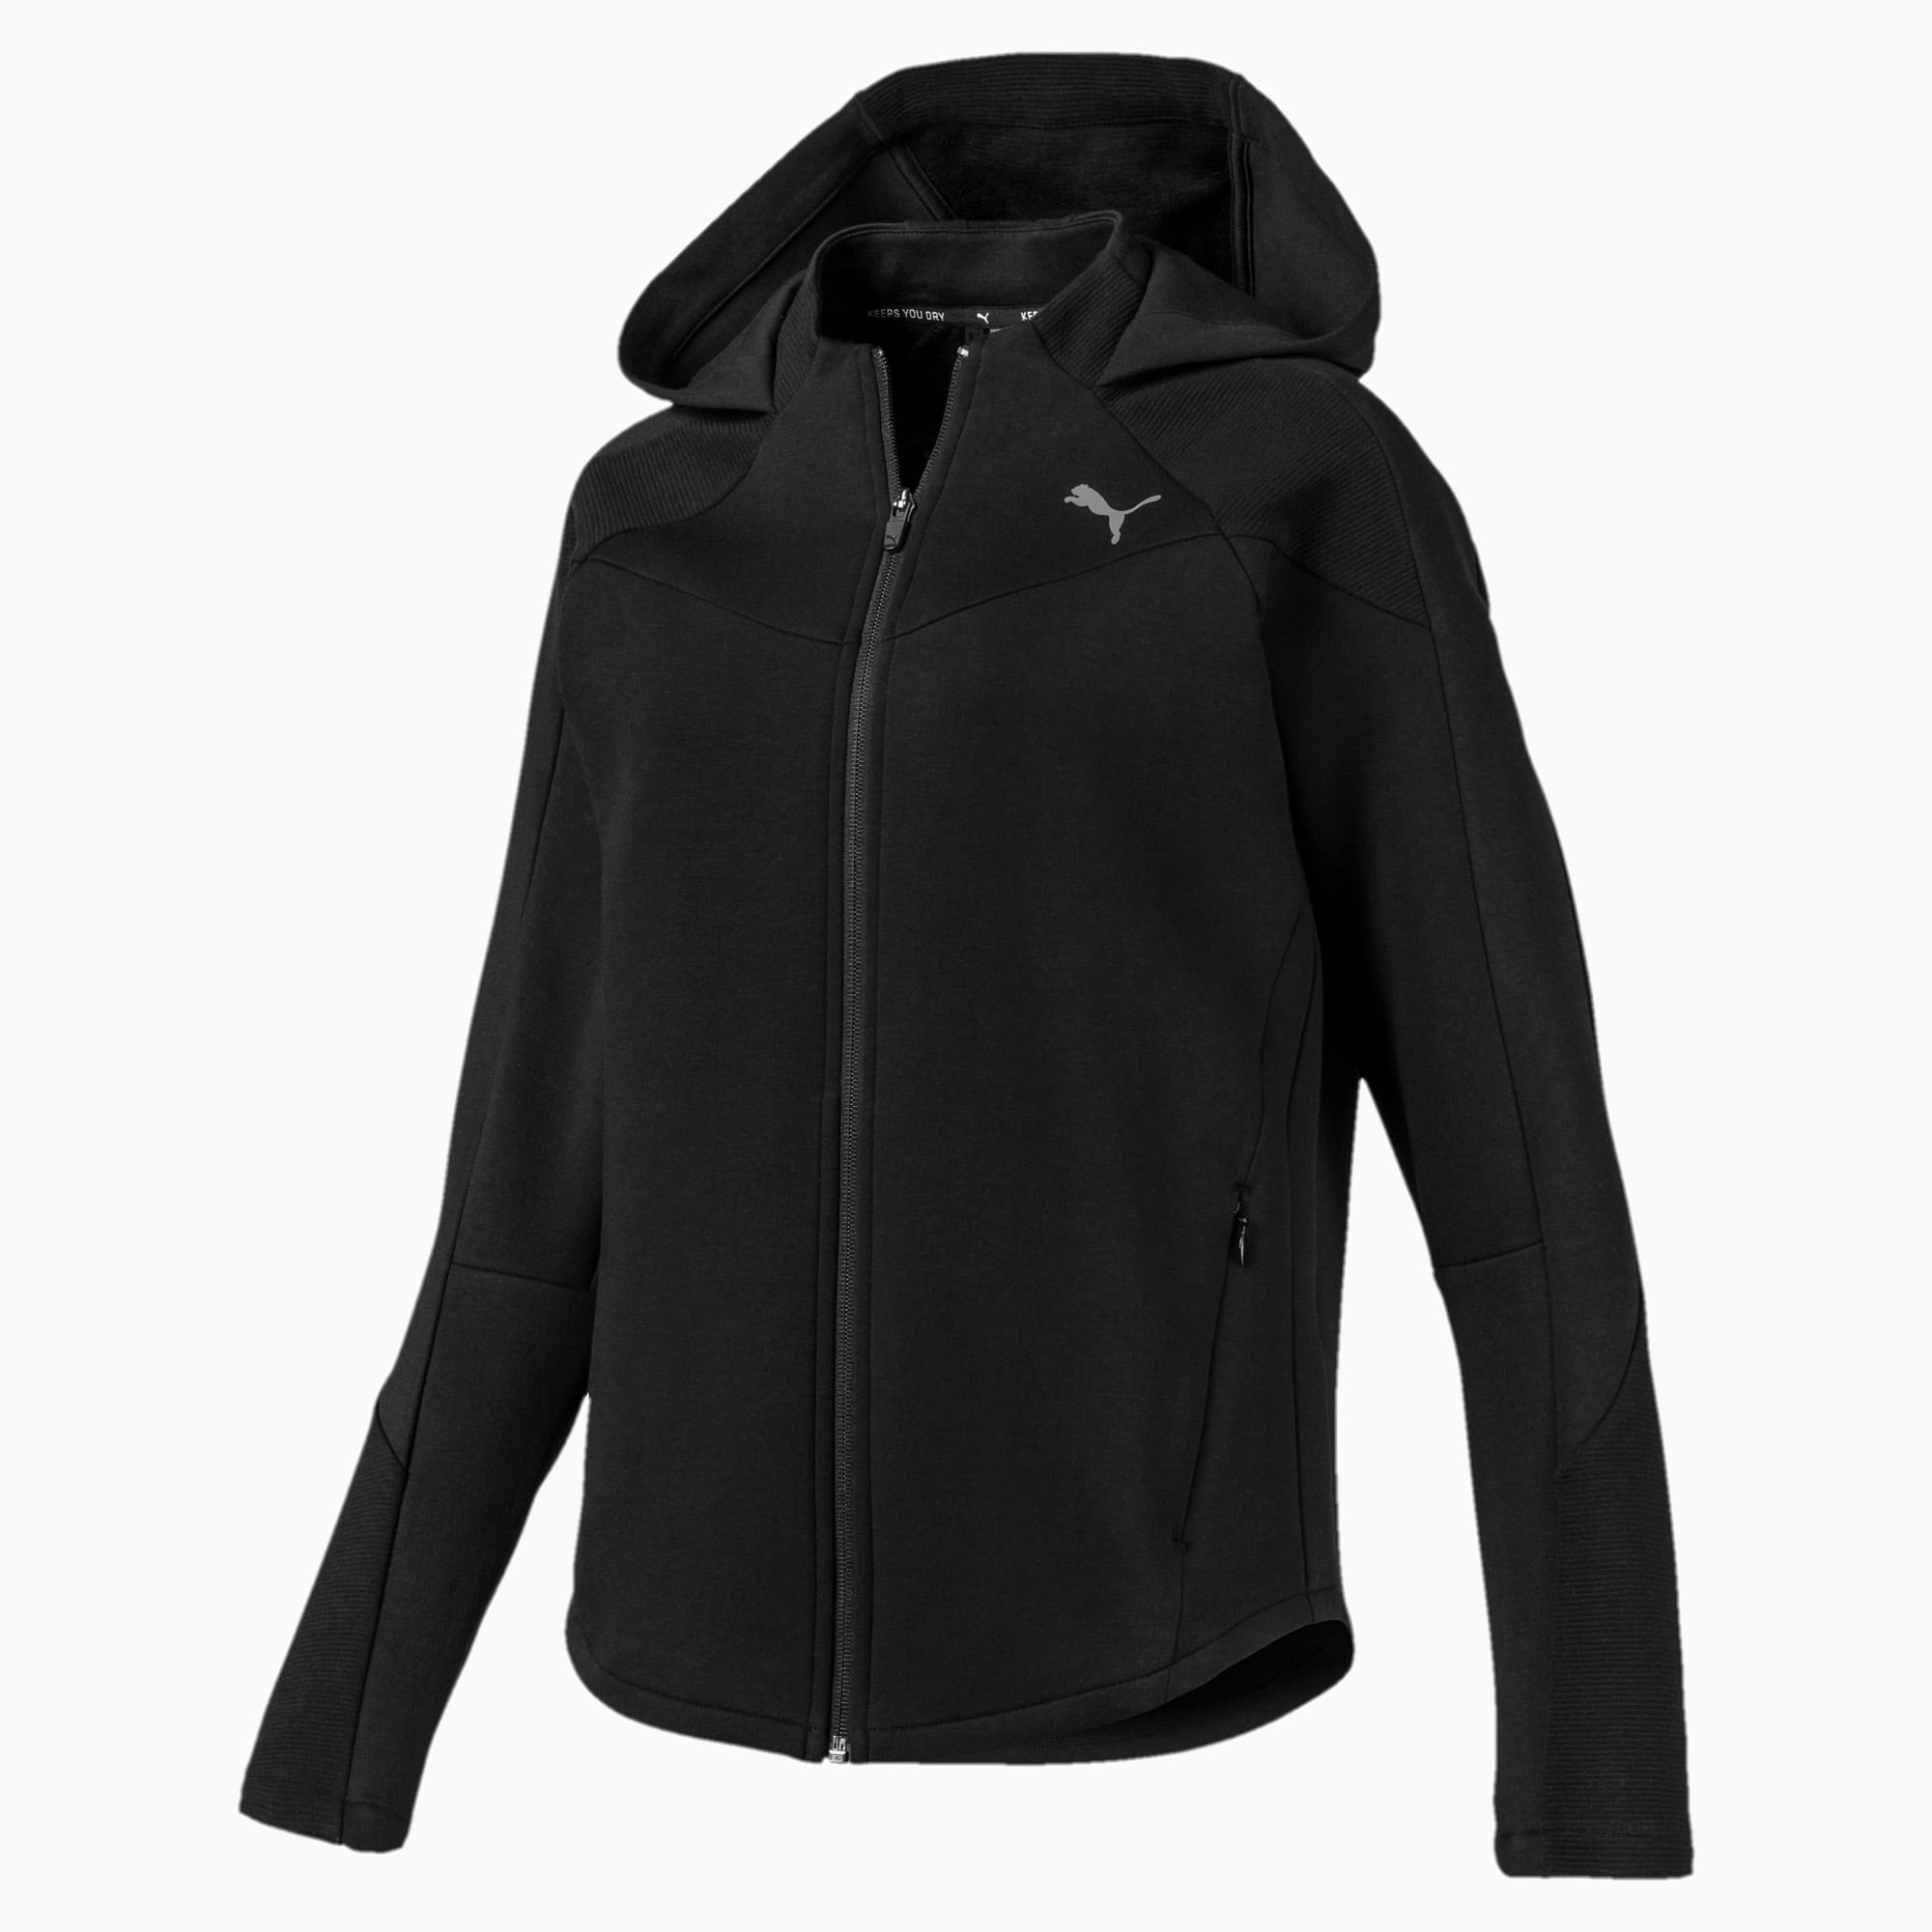 bluza rozpinana hoodie puma selena gomez